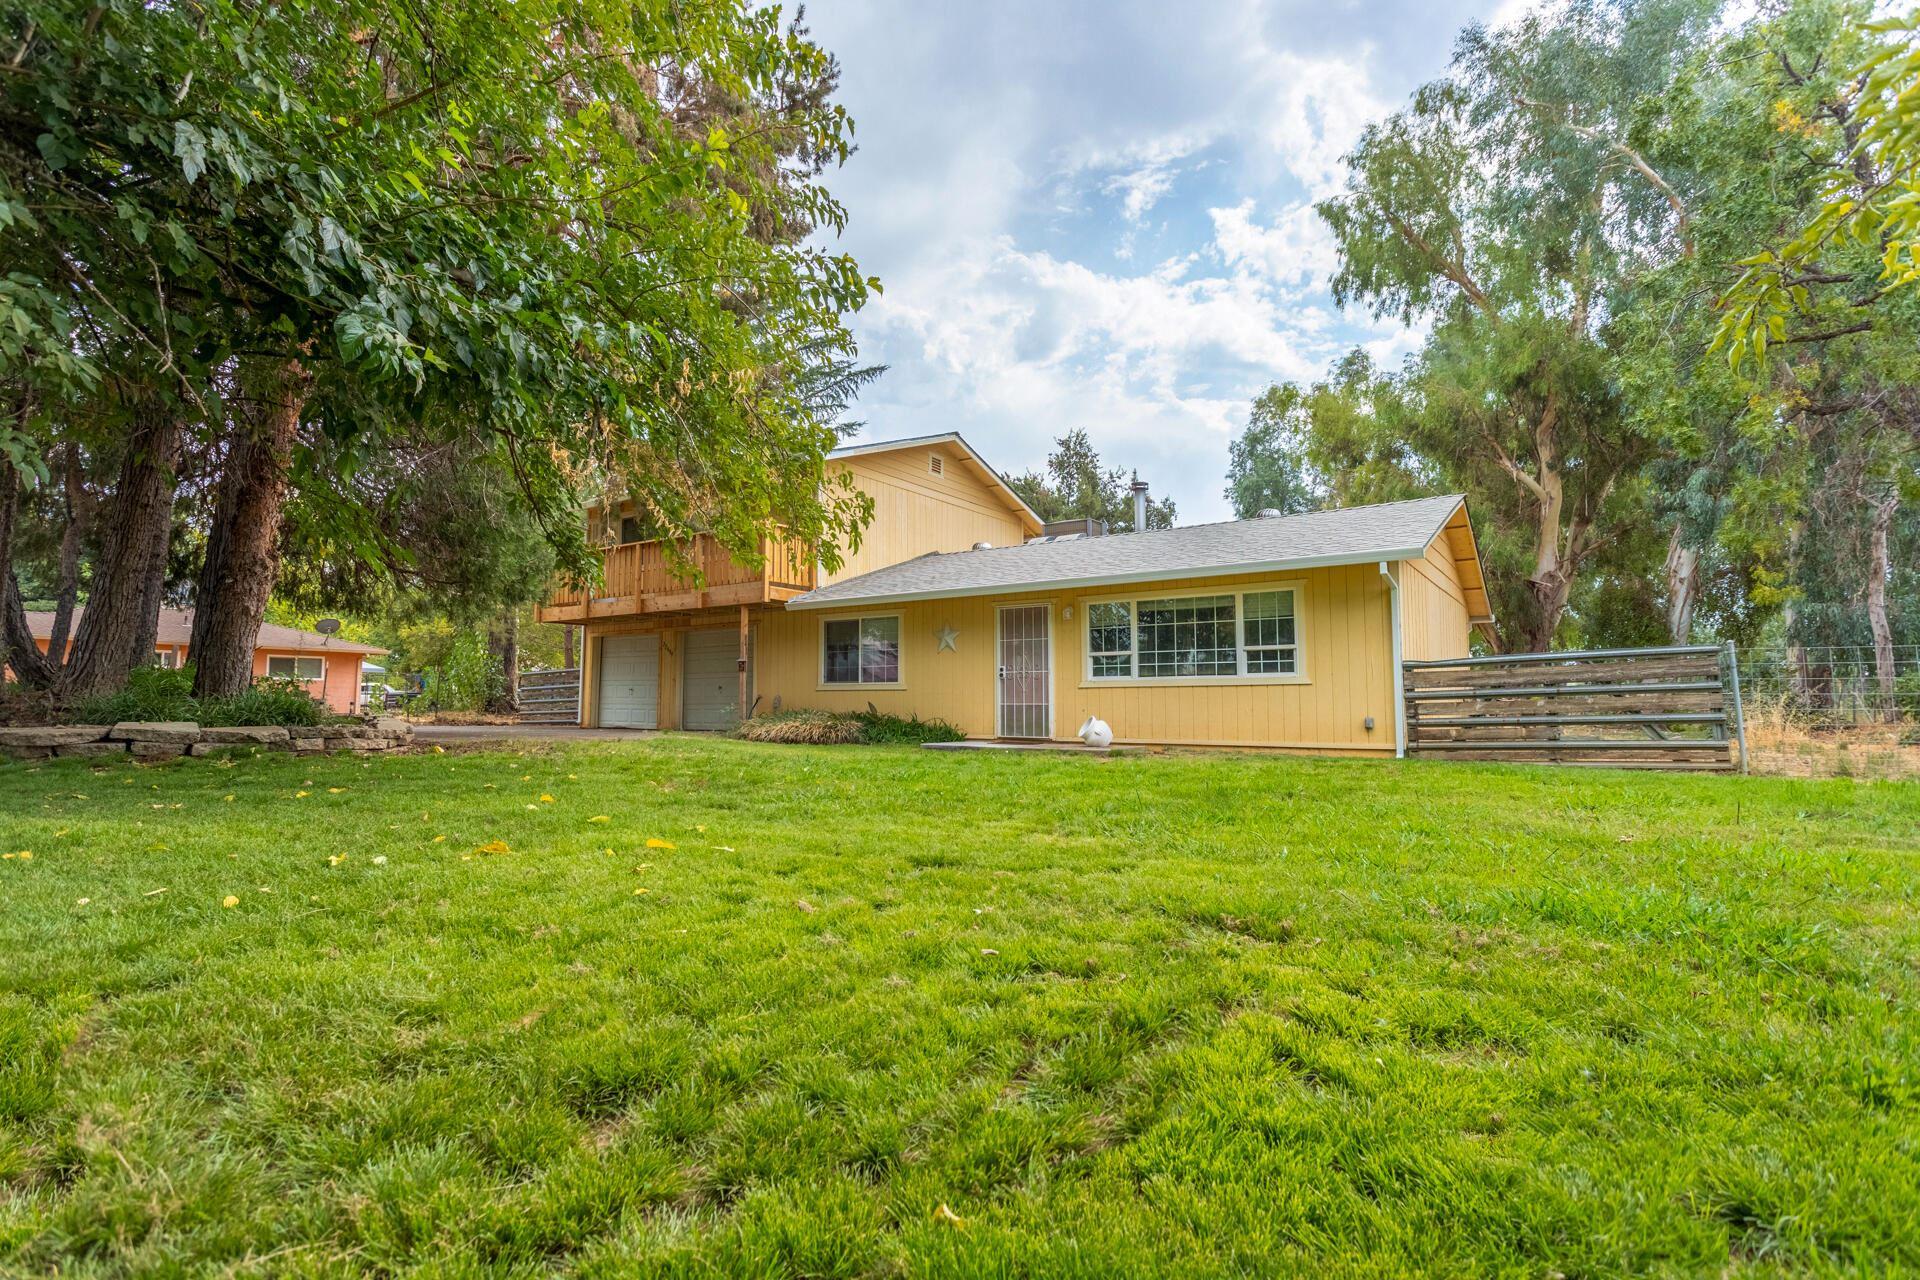 Photo of 22499 Venzke Rd, Cottonwood, CA 96022 (MLS # 21-4553)